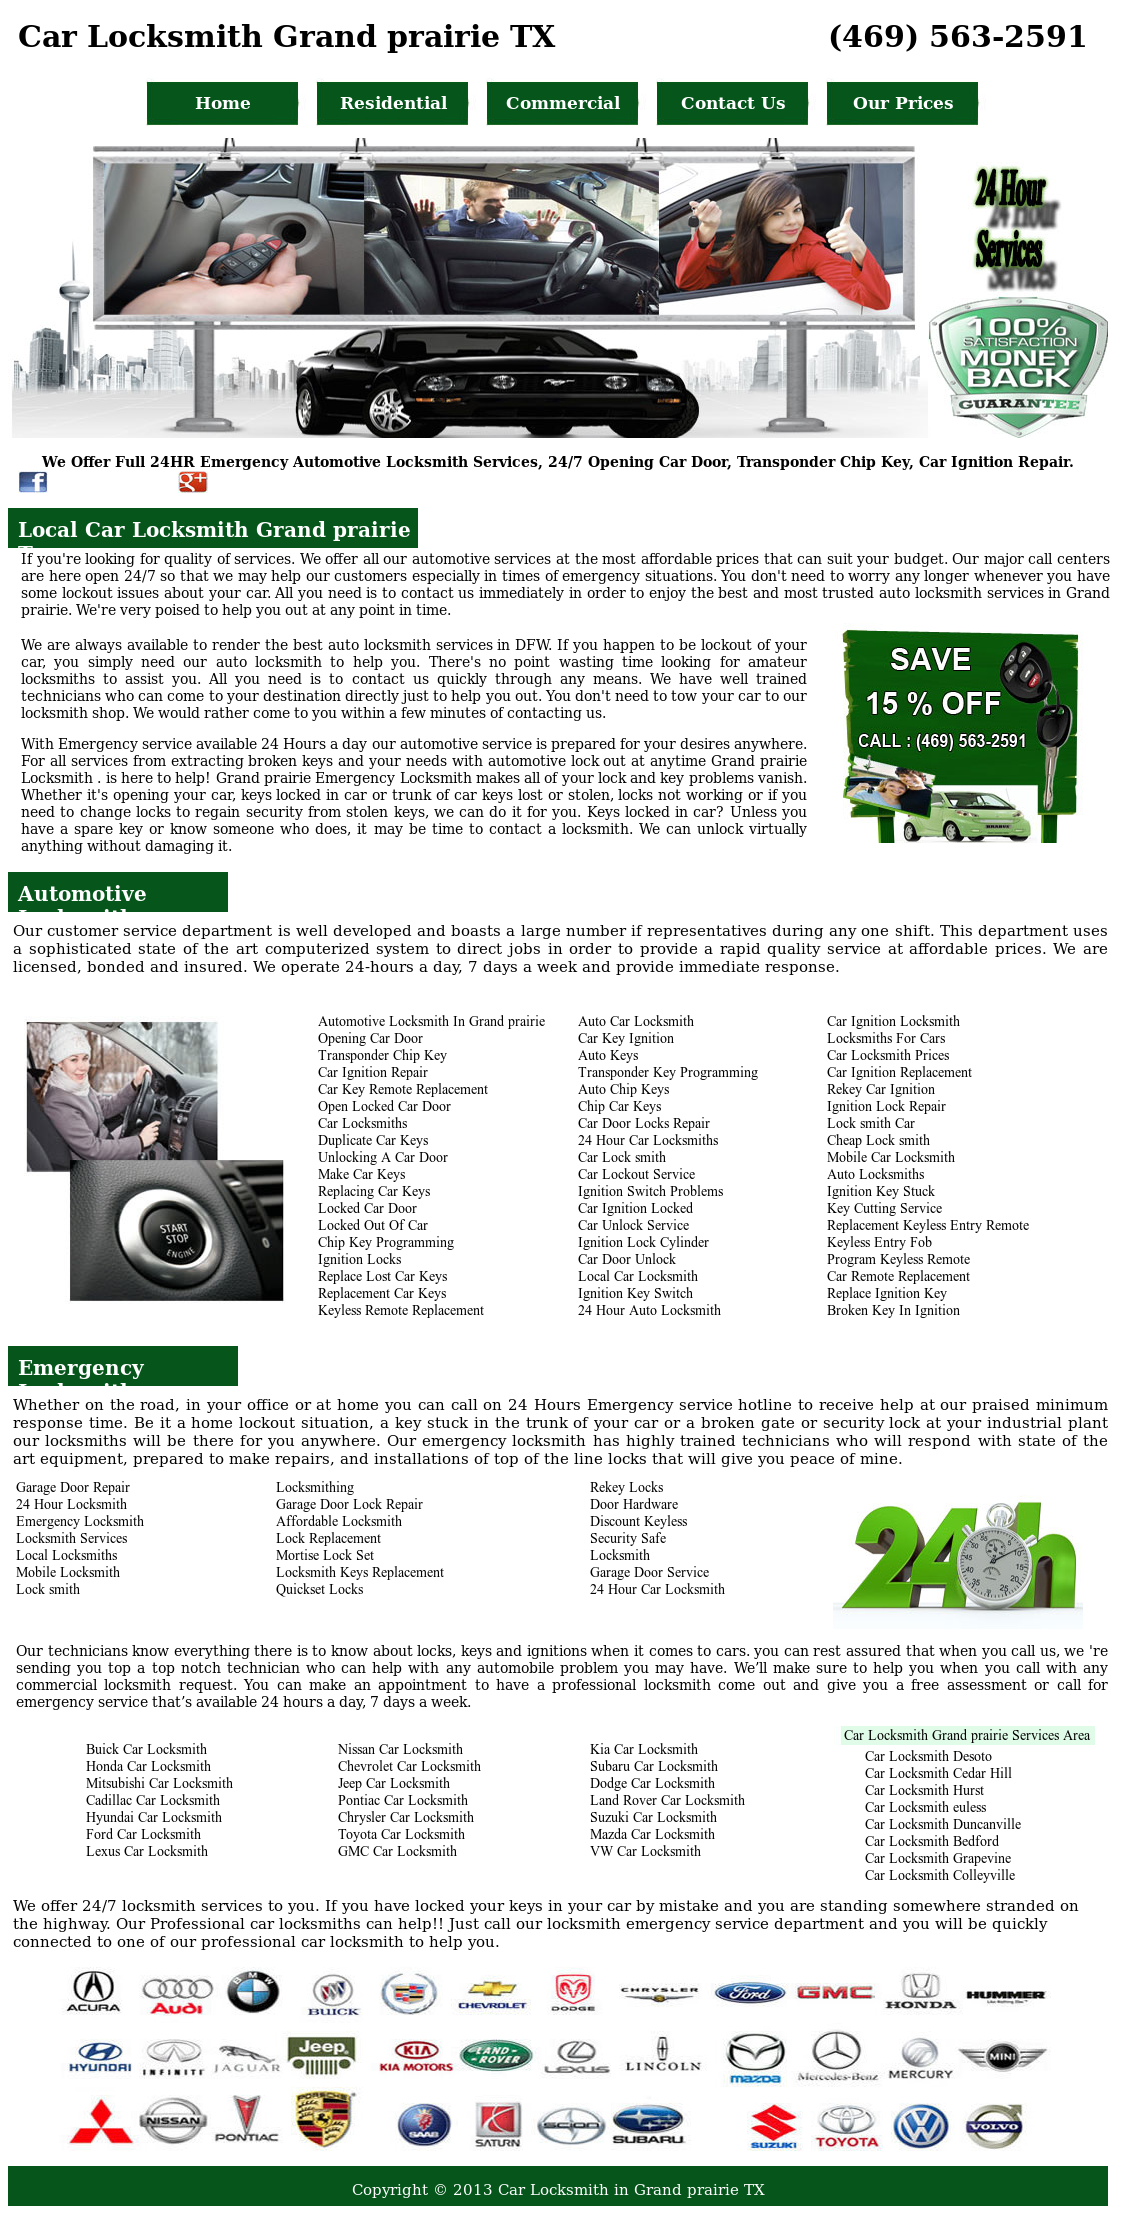 Car Locksmith Grand Prairie Competitors, Revenue and